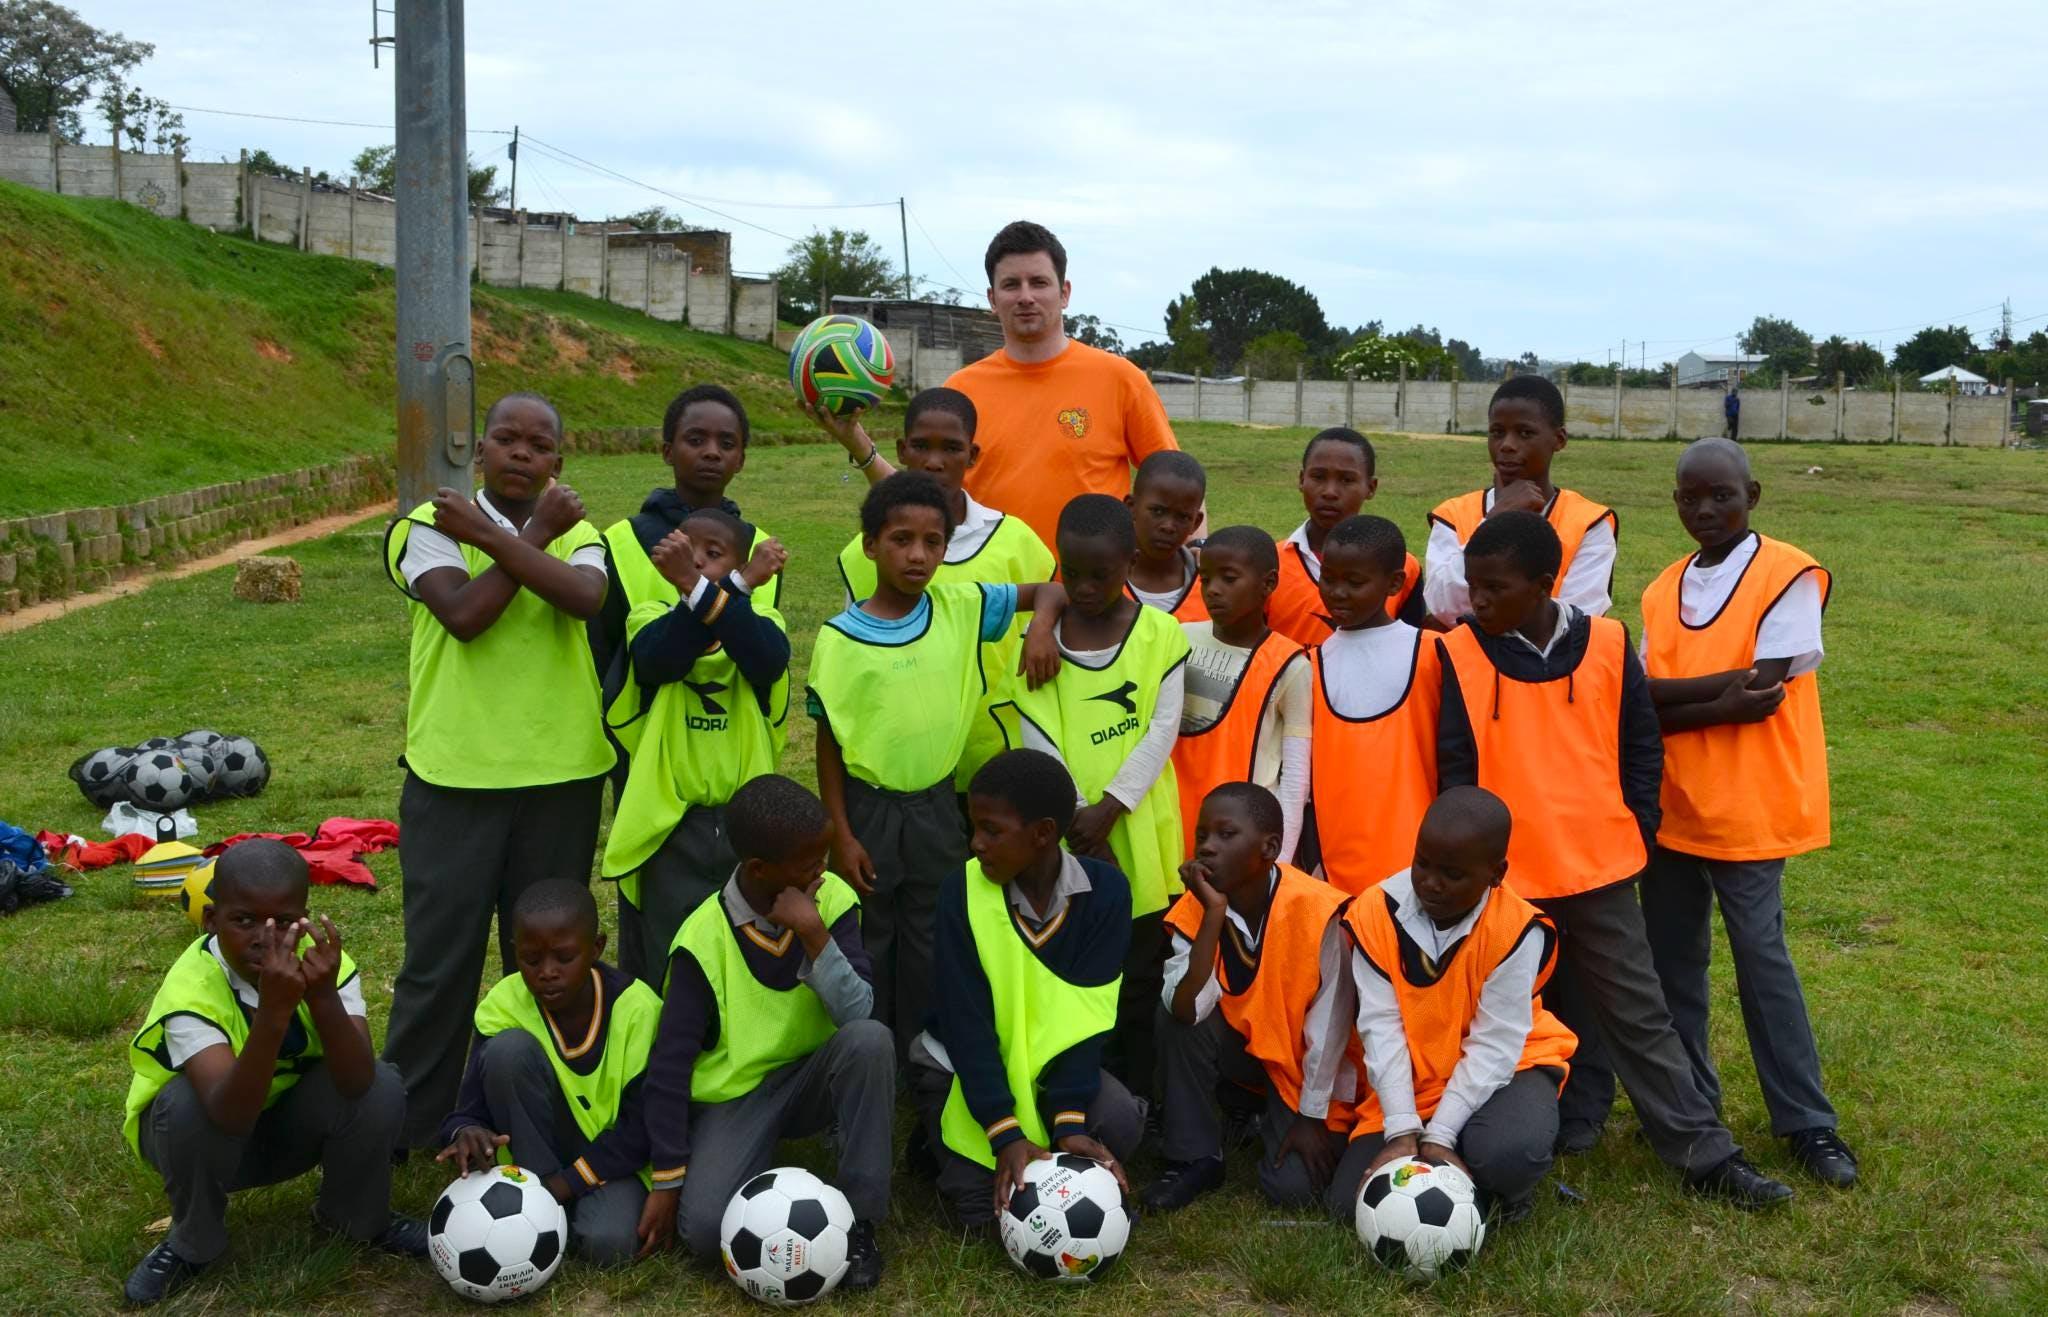 Sports Coaching & Community Volunteering